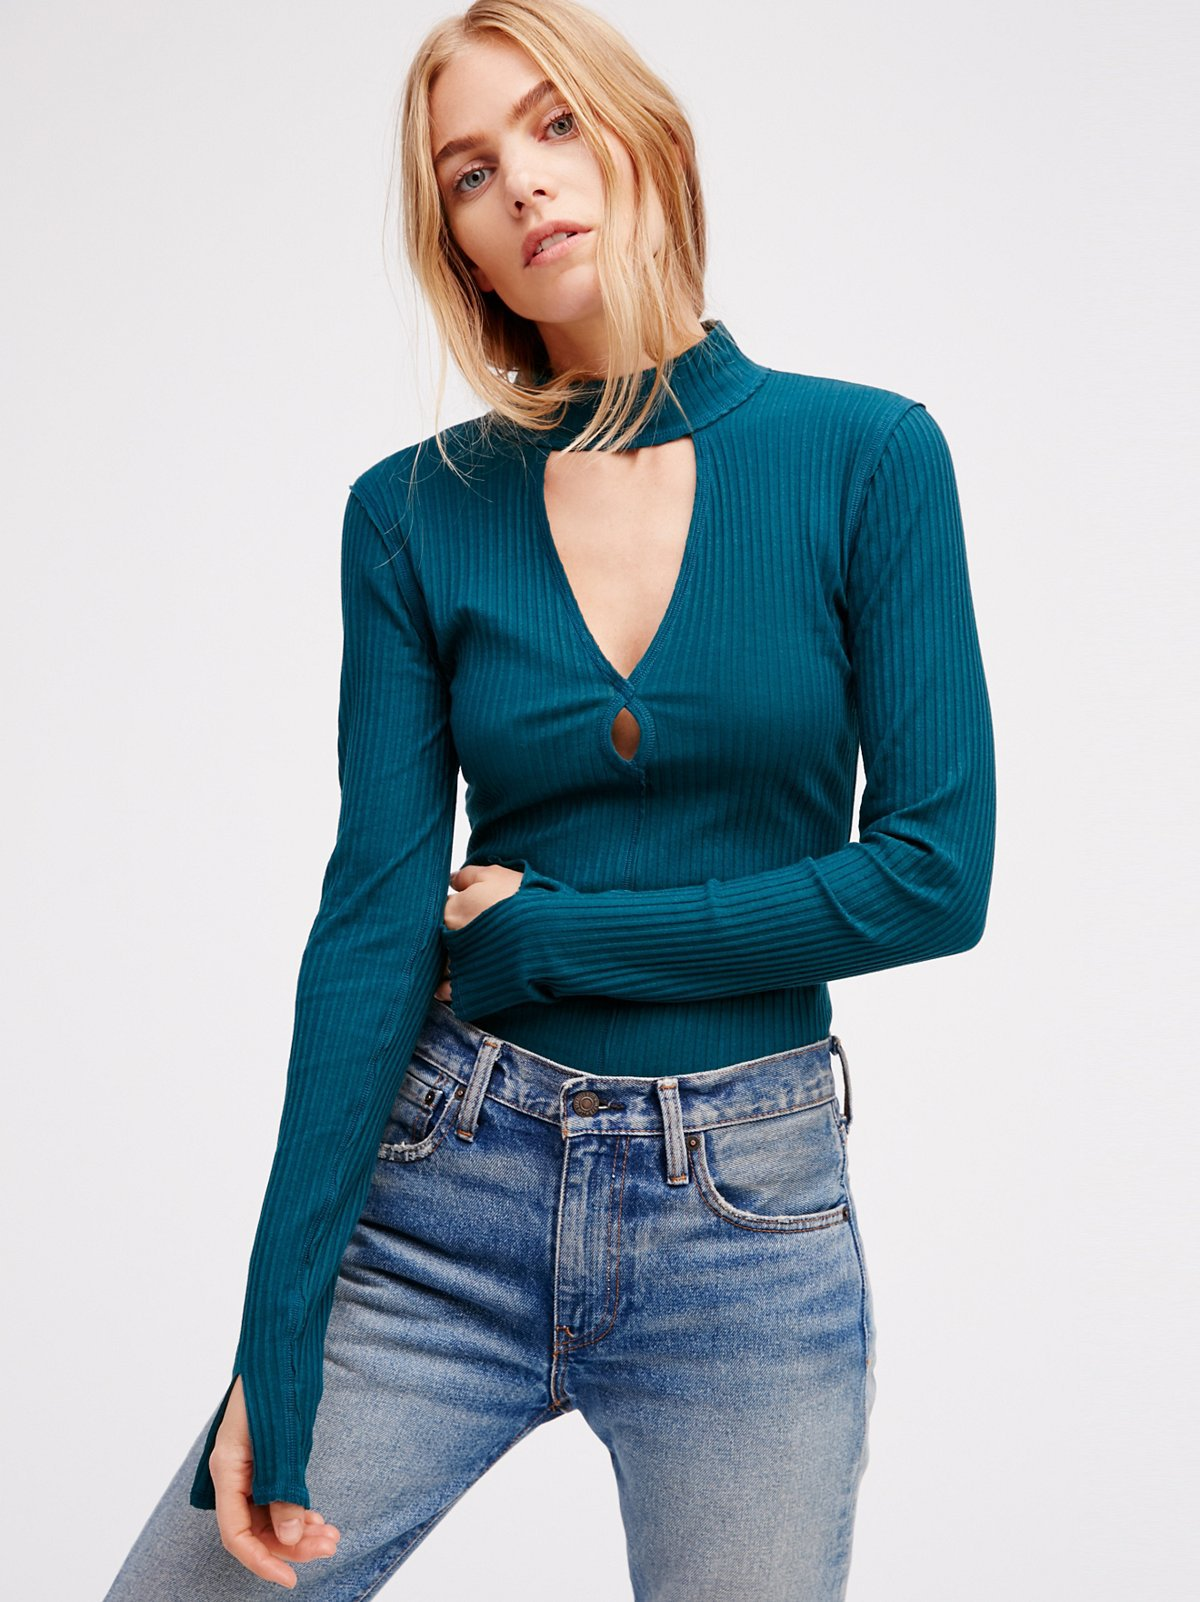 New Women's Slim Sweaters High Collar Long Sleeve <font><b>Pullover</b></font> Femme <font><b>Rib</b></font> Unlined Upper Garment <font><b>Hollow</b></font> <font><b>Out</b></font> Sexy <font><b>Knitted</b></font> Base Sweater